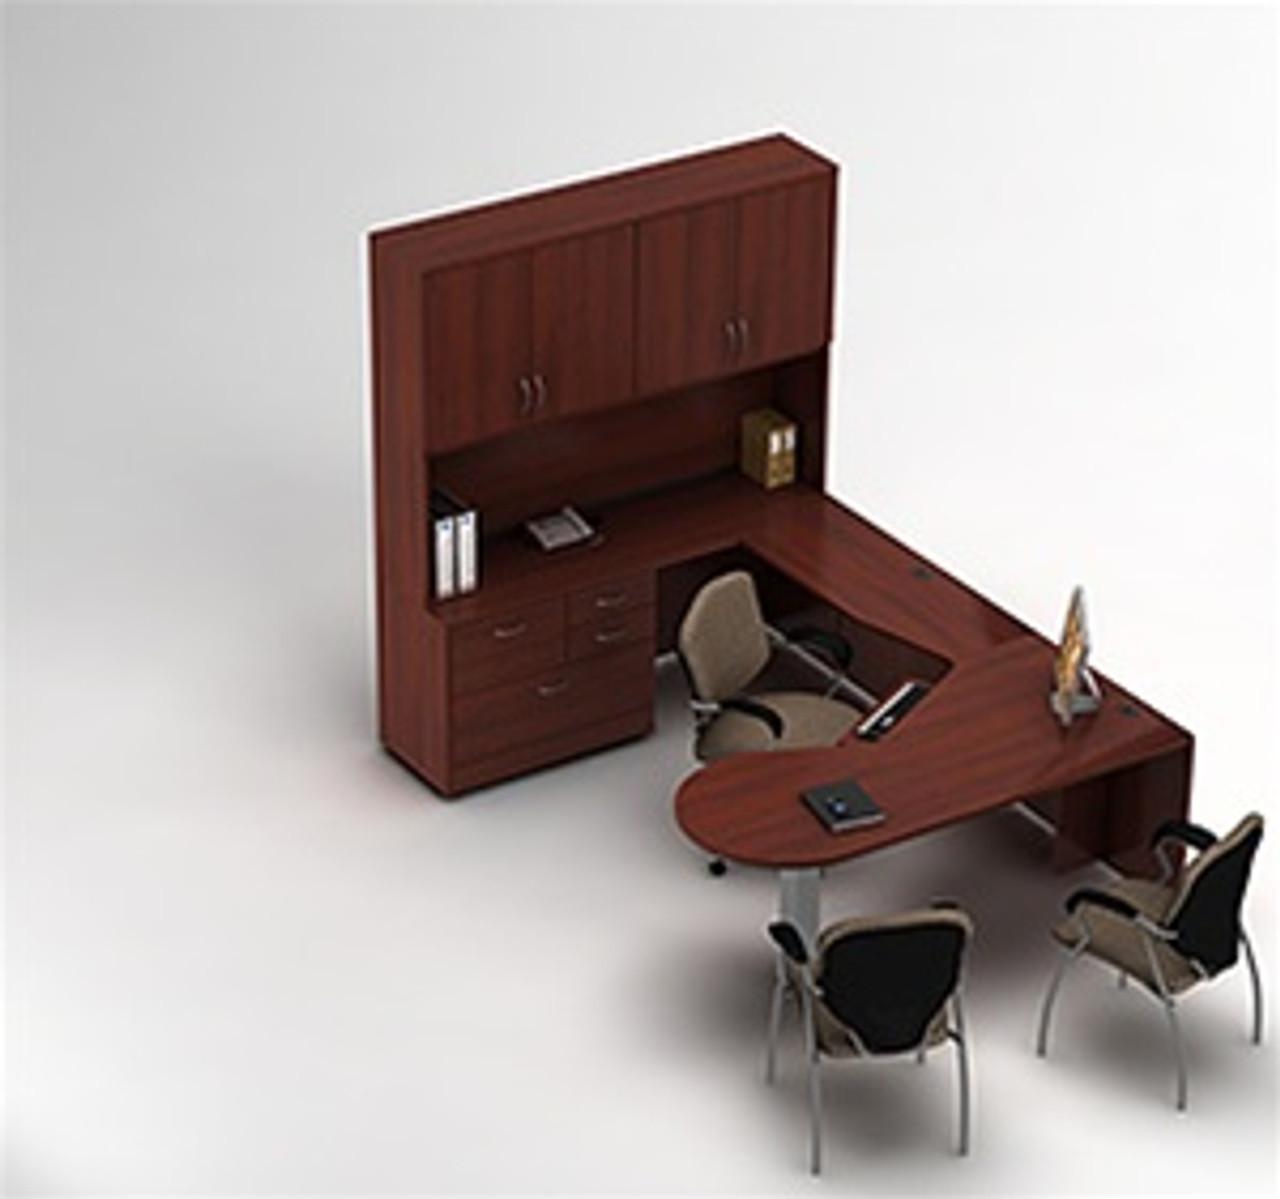 Image of: Global Zira Series Executive Desk Configuration 14